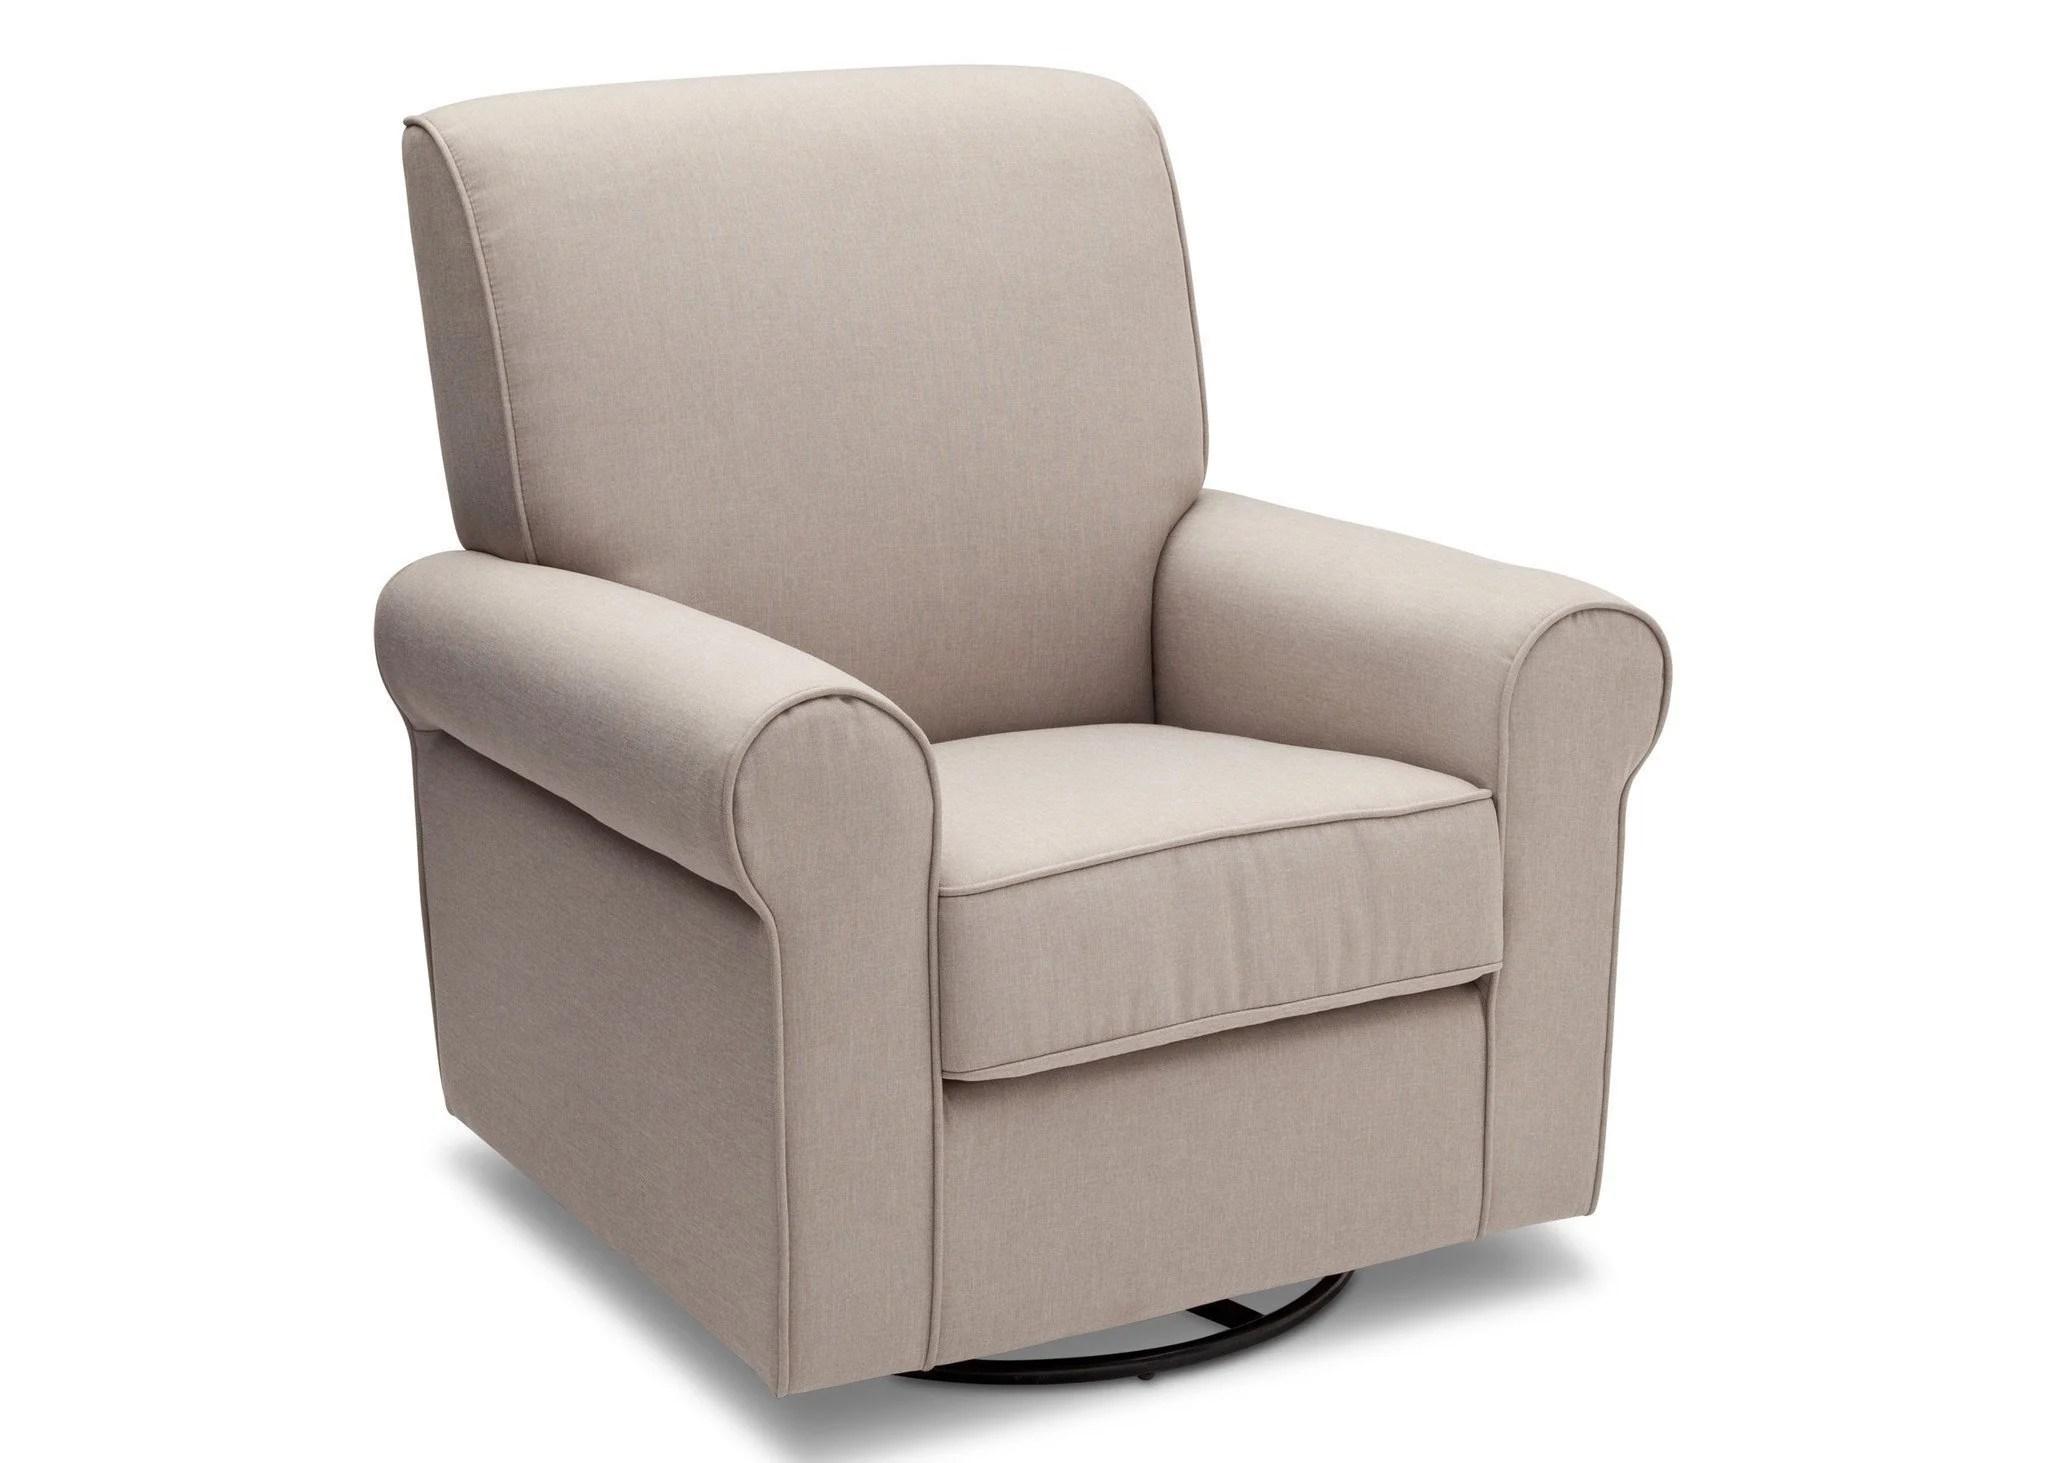 delta avery nursery glider chair grey steelcase pollock upholstered children